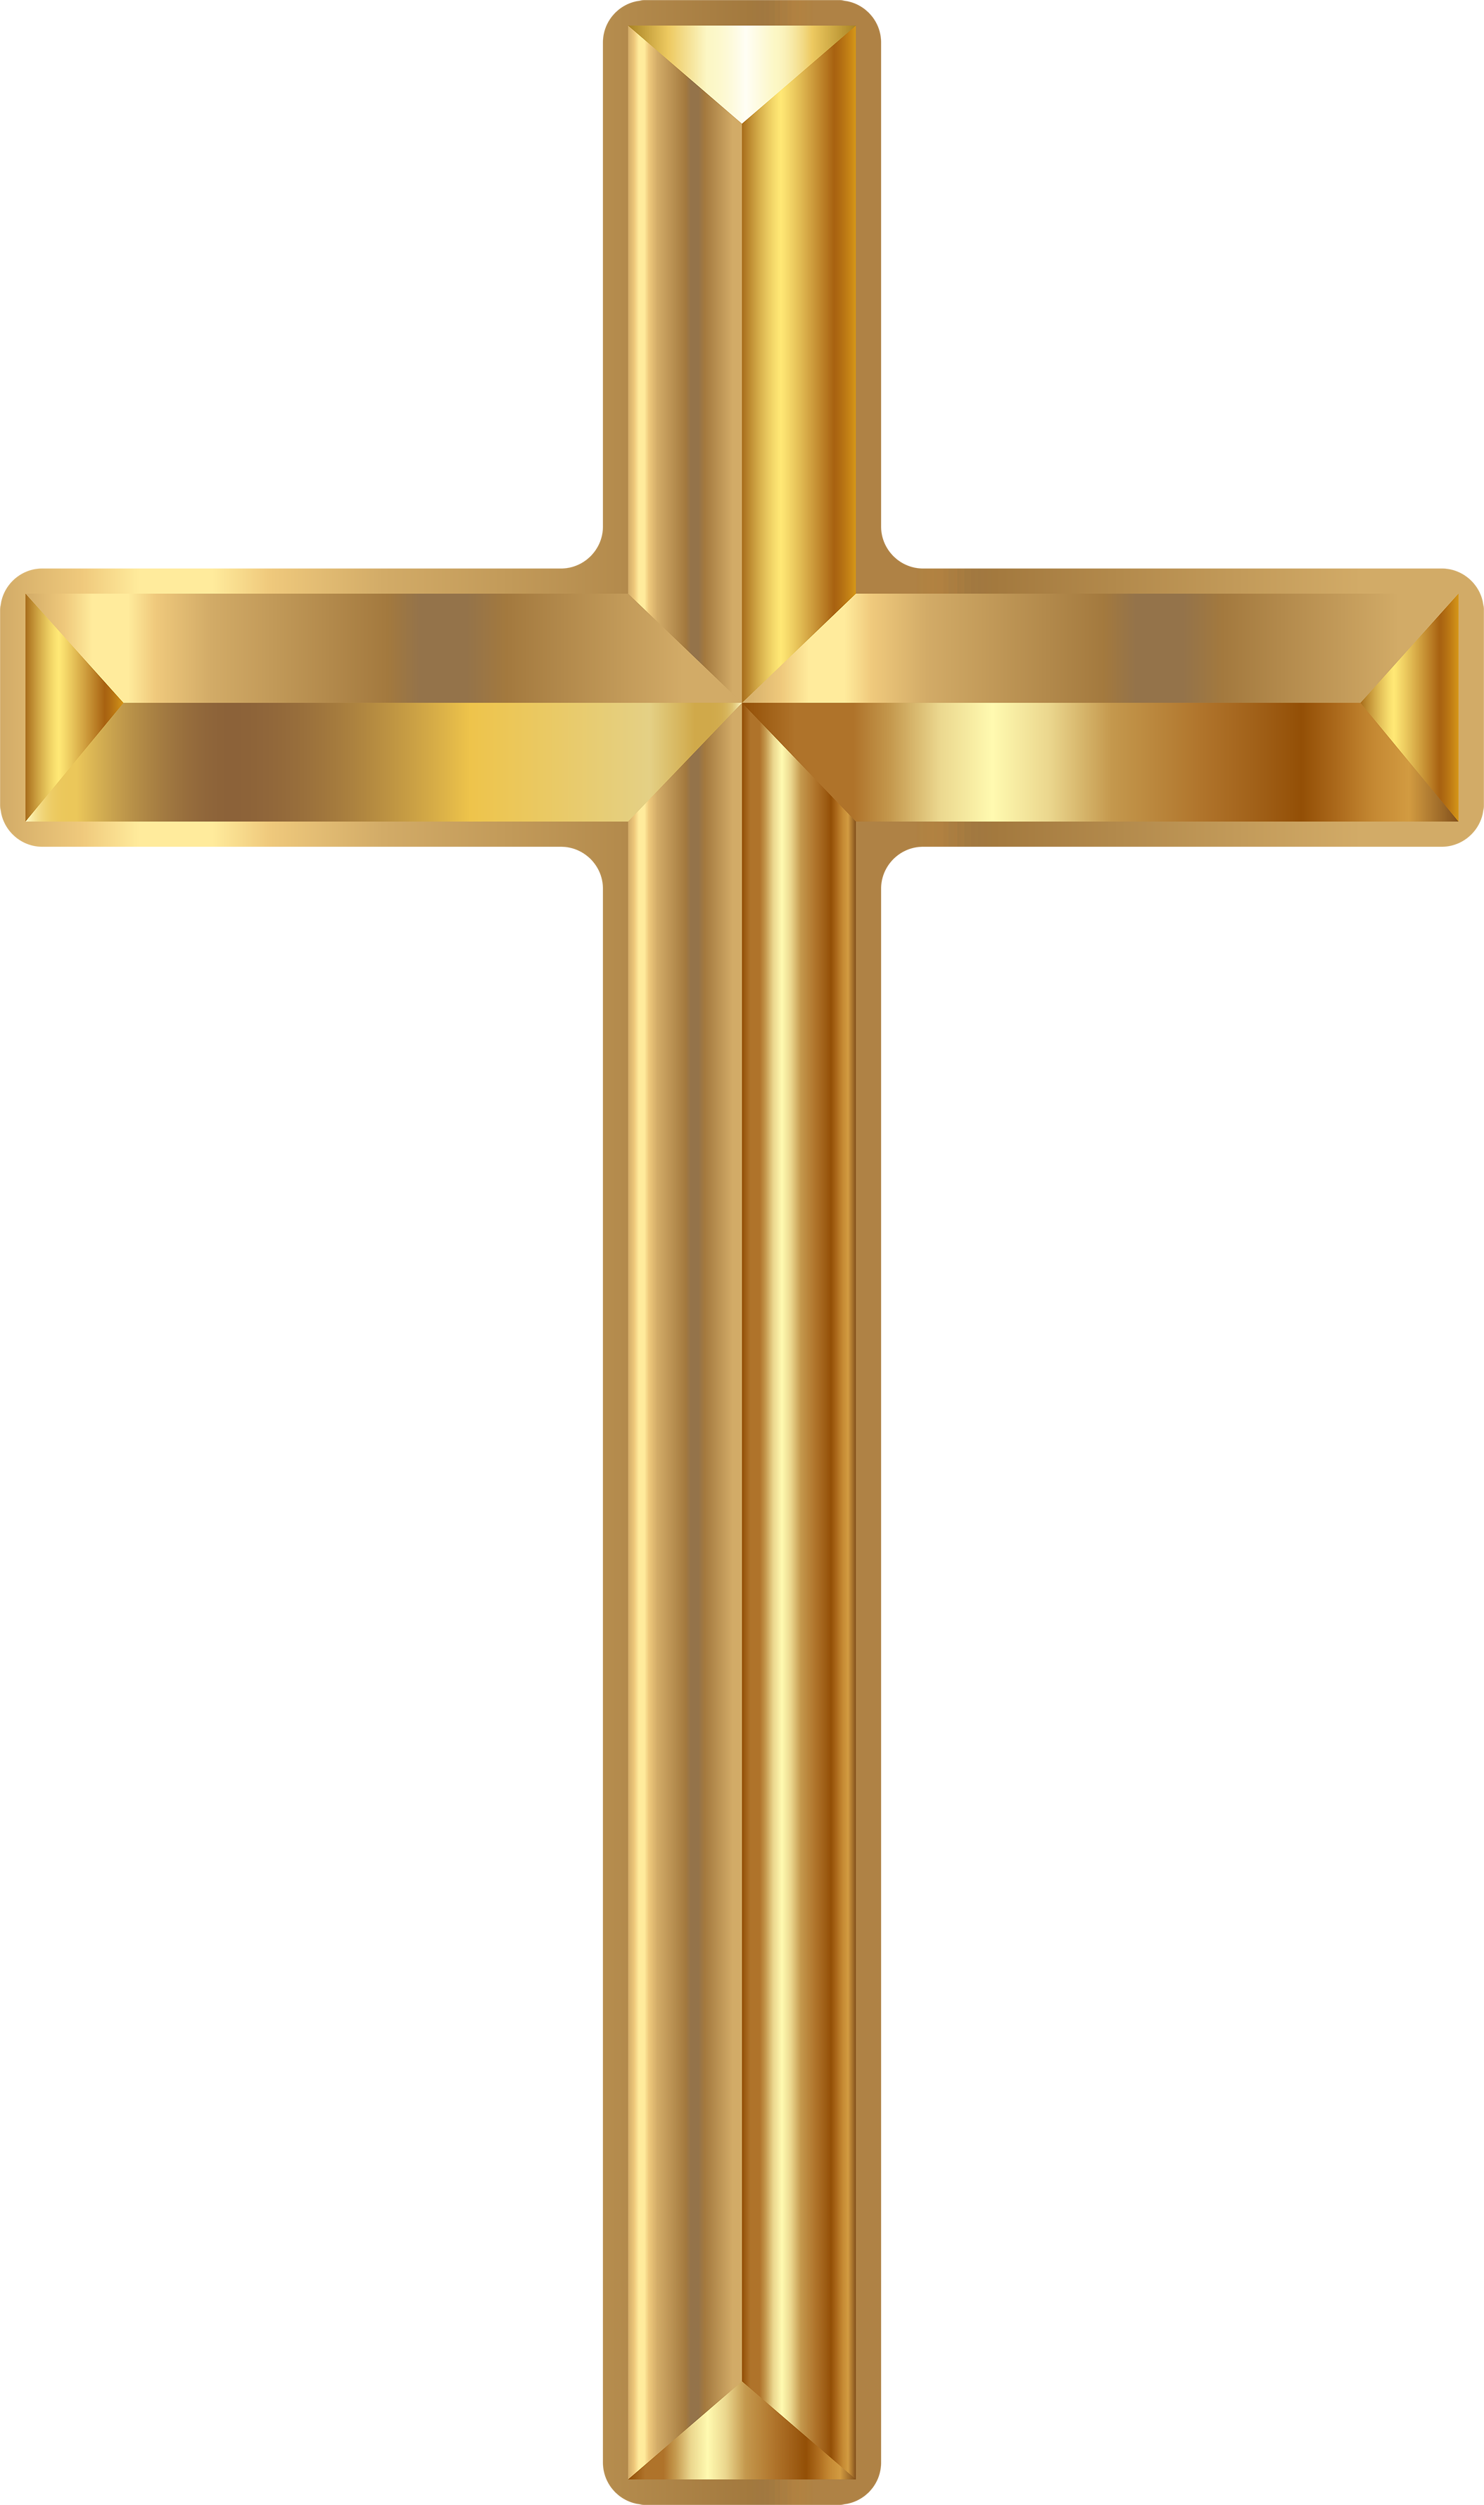 Christian cross png images. Crucifix clipart transparent background